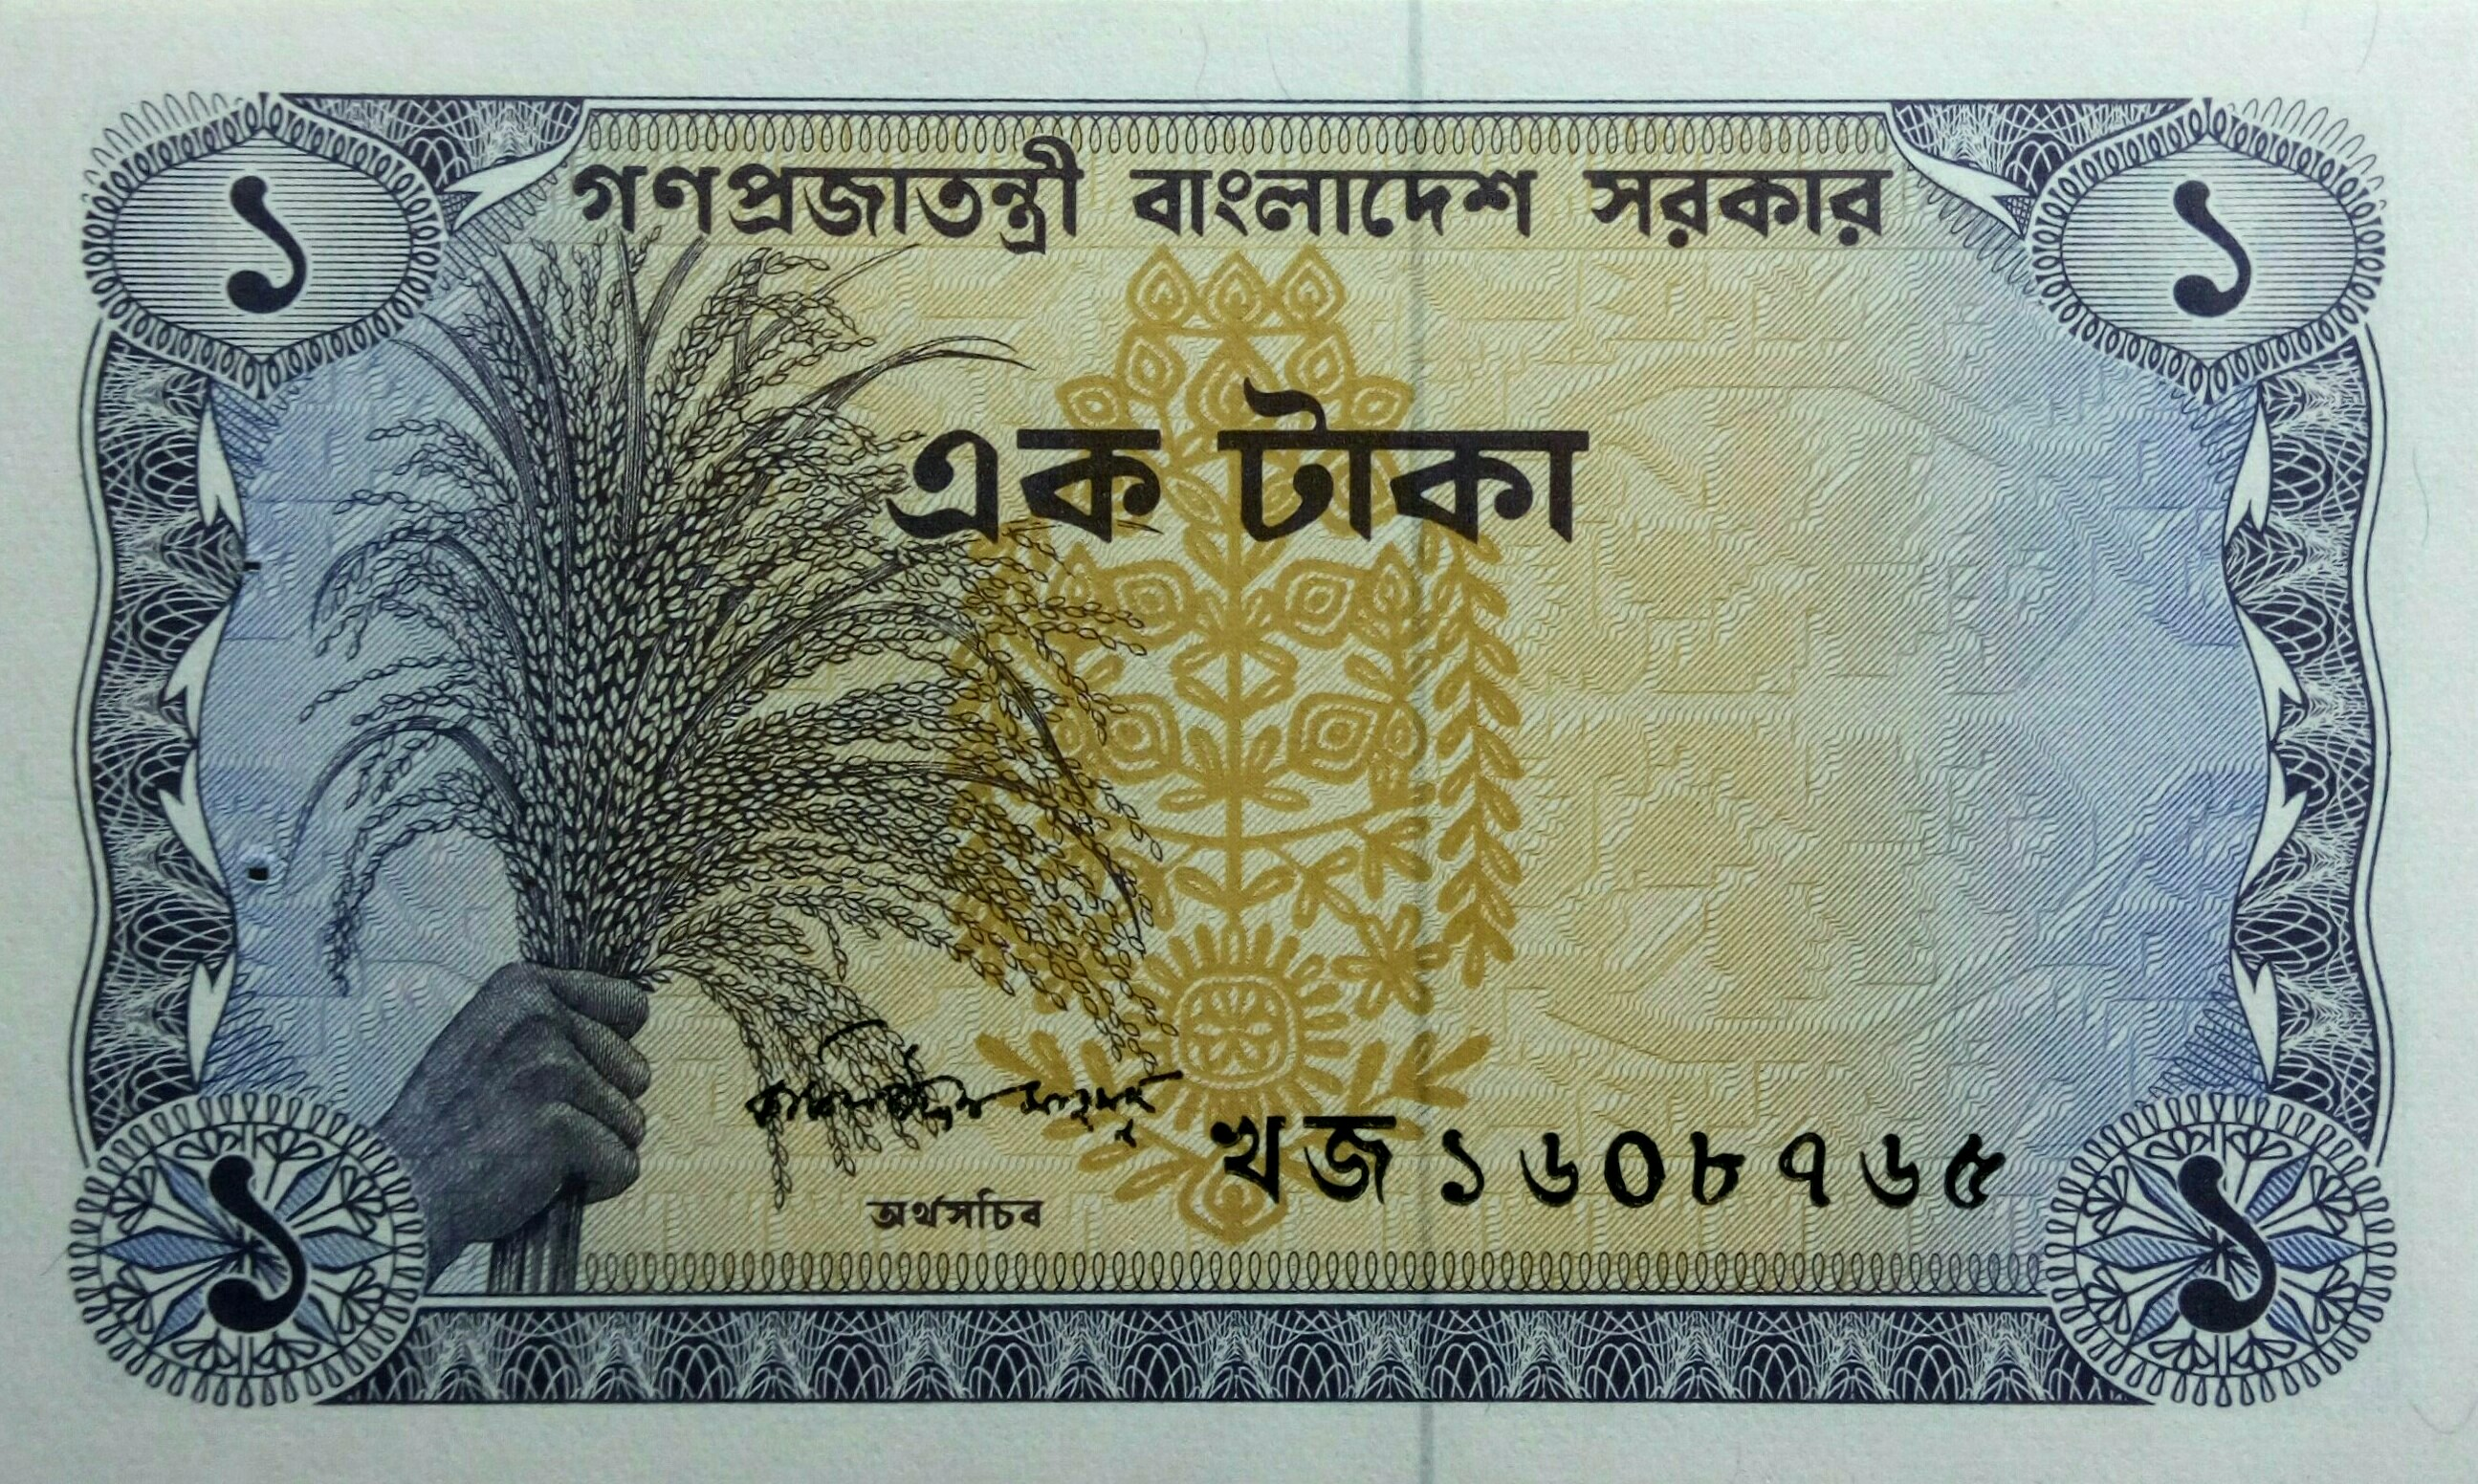 1 Taka - Bangladesh – Numista